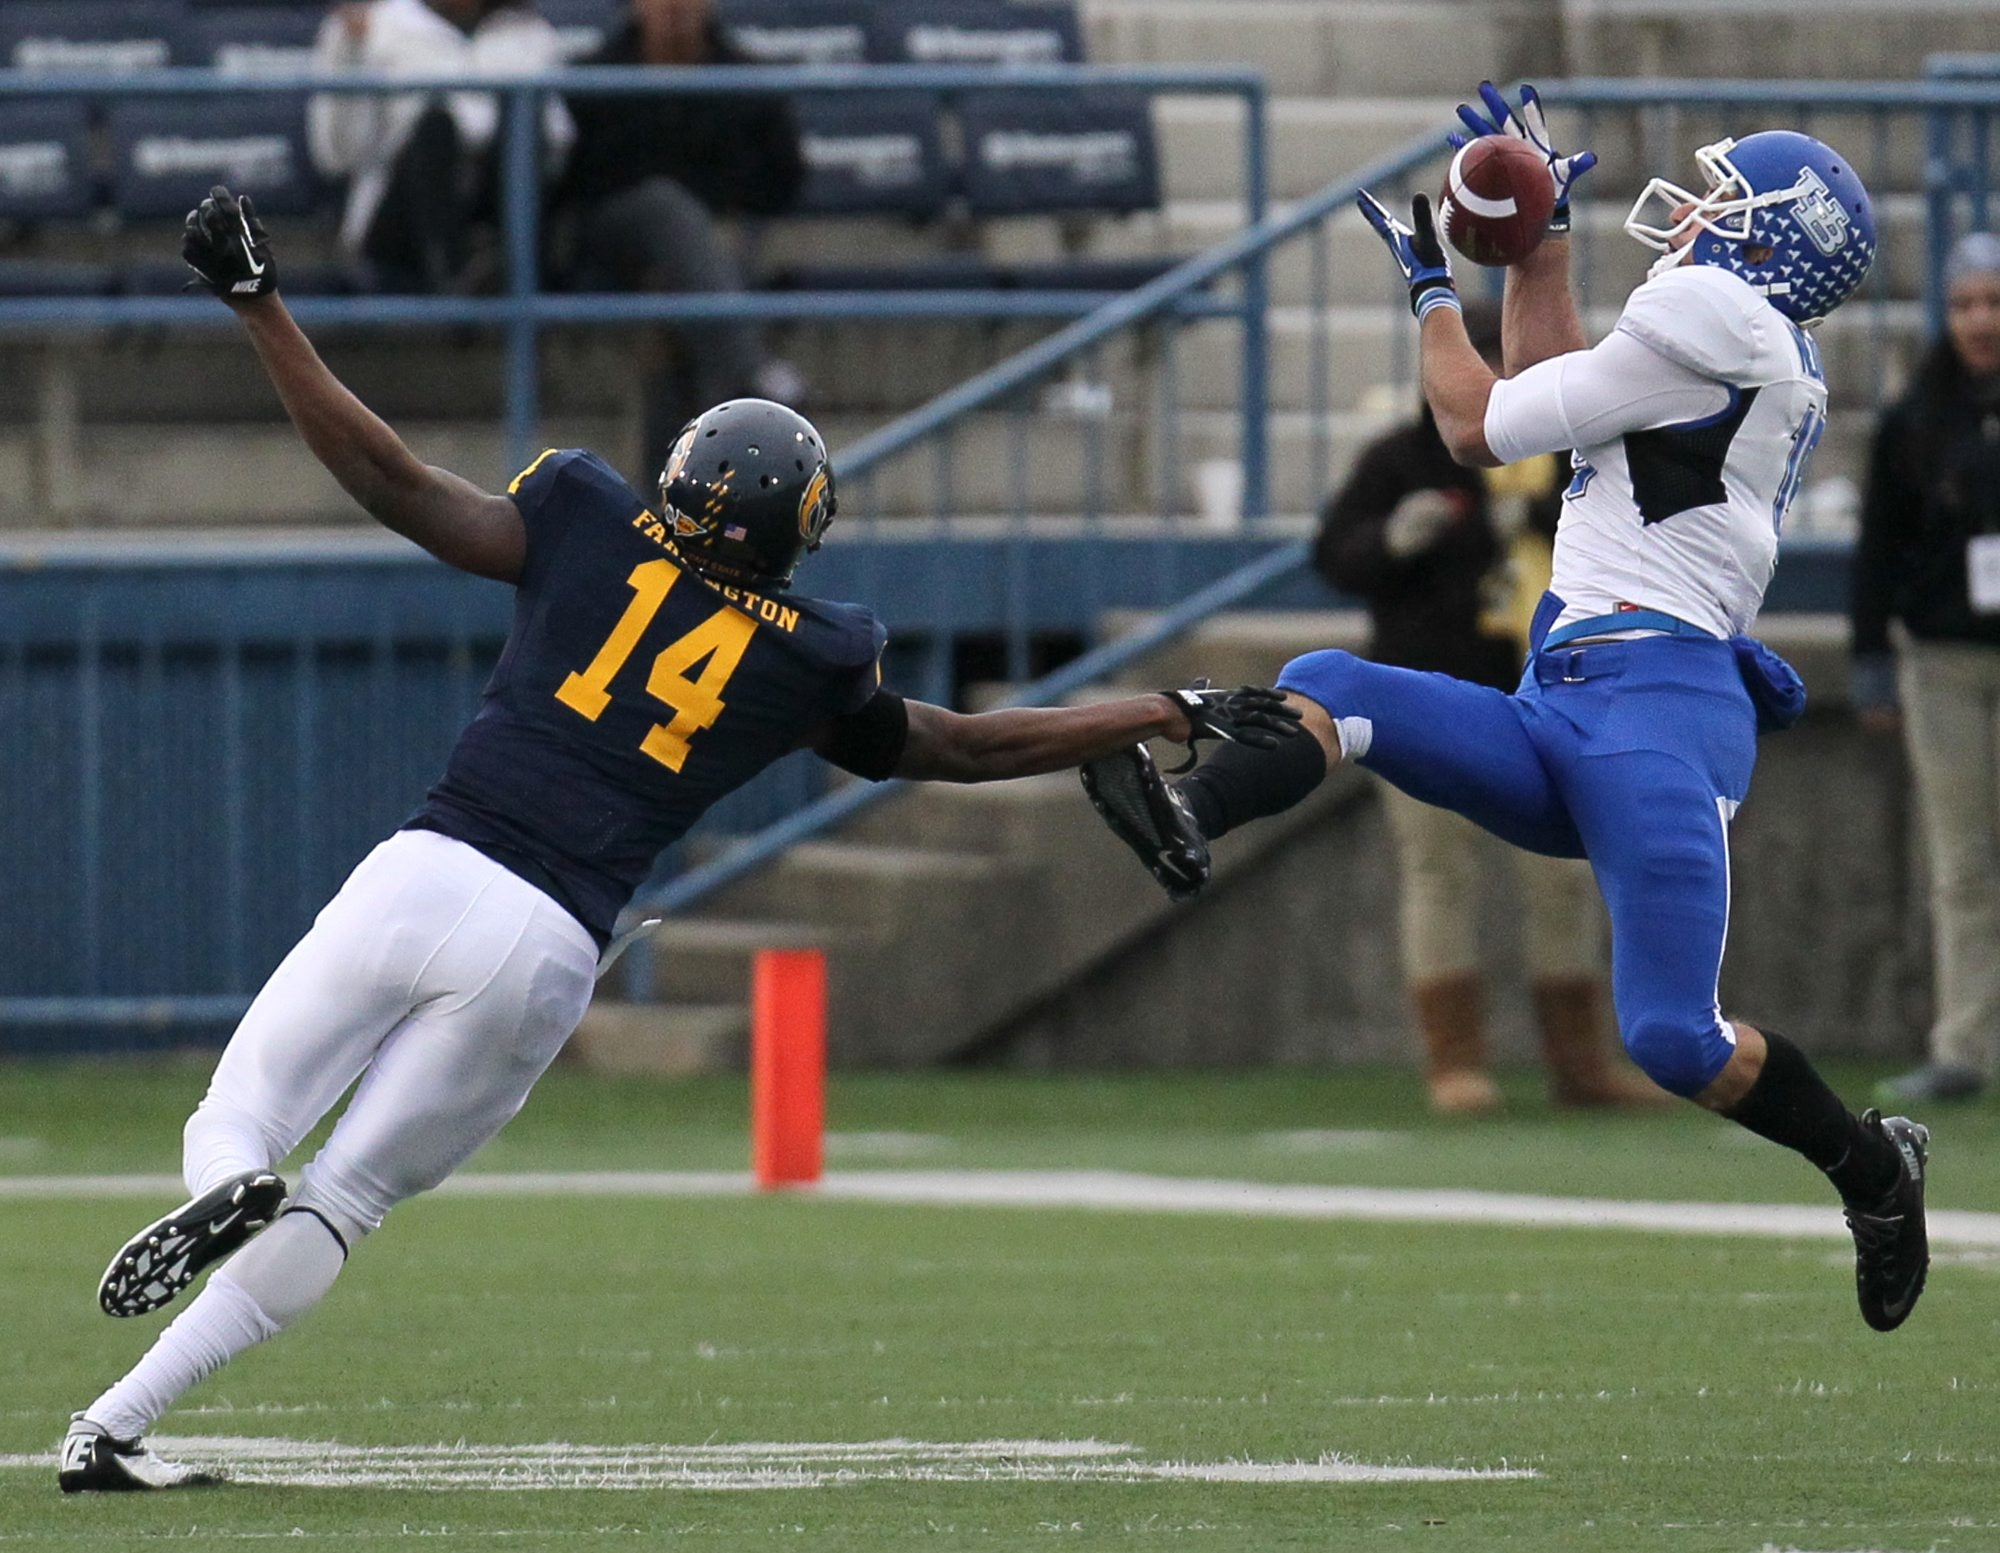 Kent State cornerback Dylan Farrington (14) can't stop Buffalo wide receiver Alex Neutz from catching a 49-yard pass.